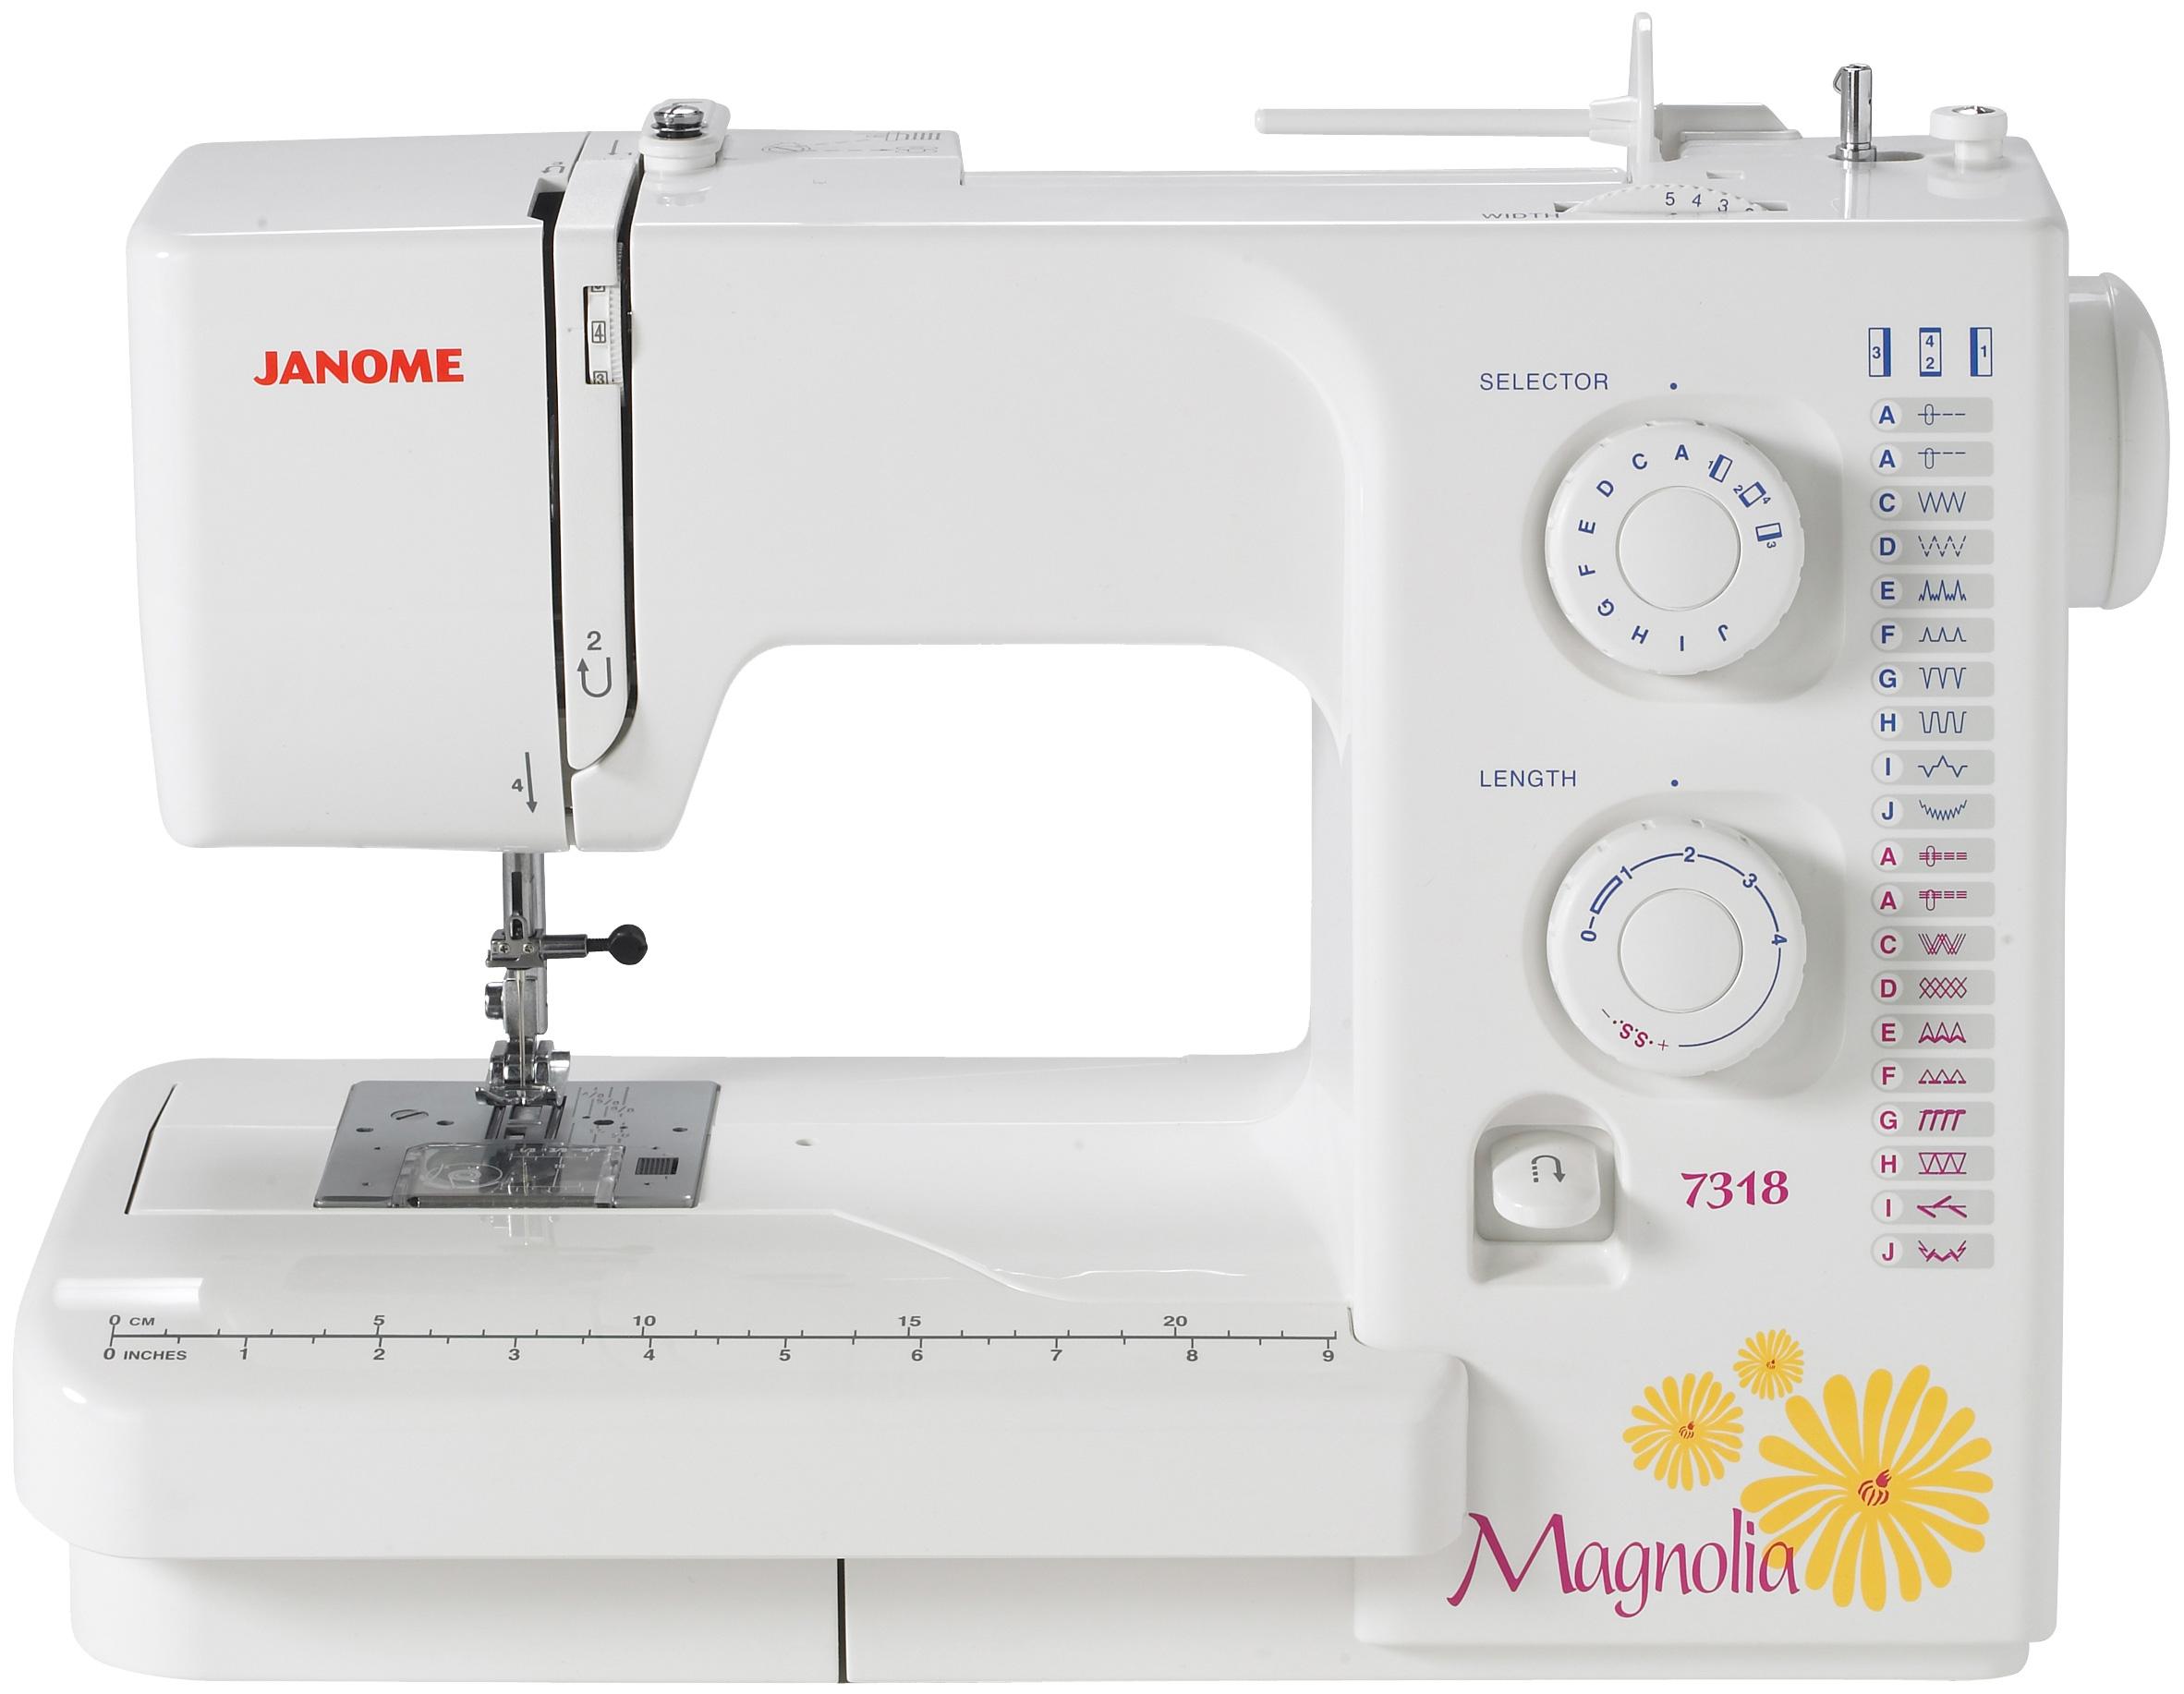 mechanical machine quilting janome sewing original quilt refurbished